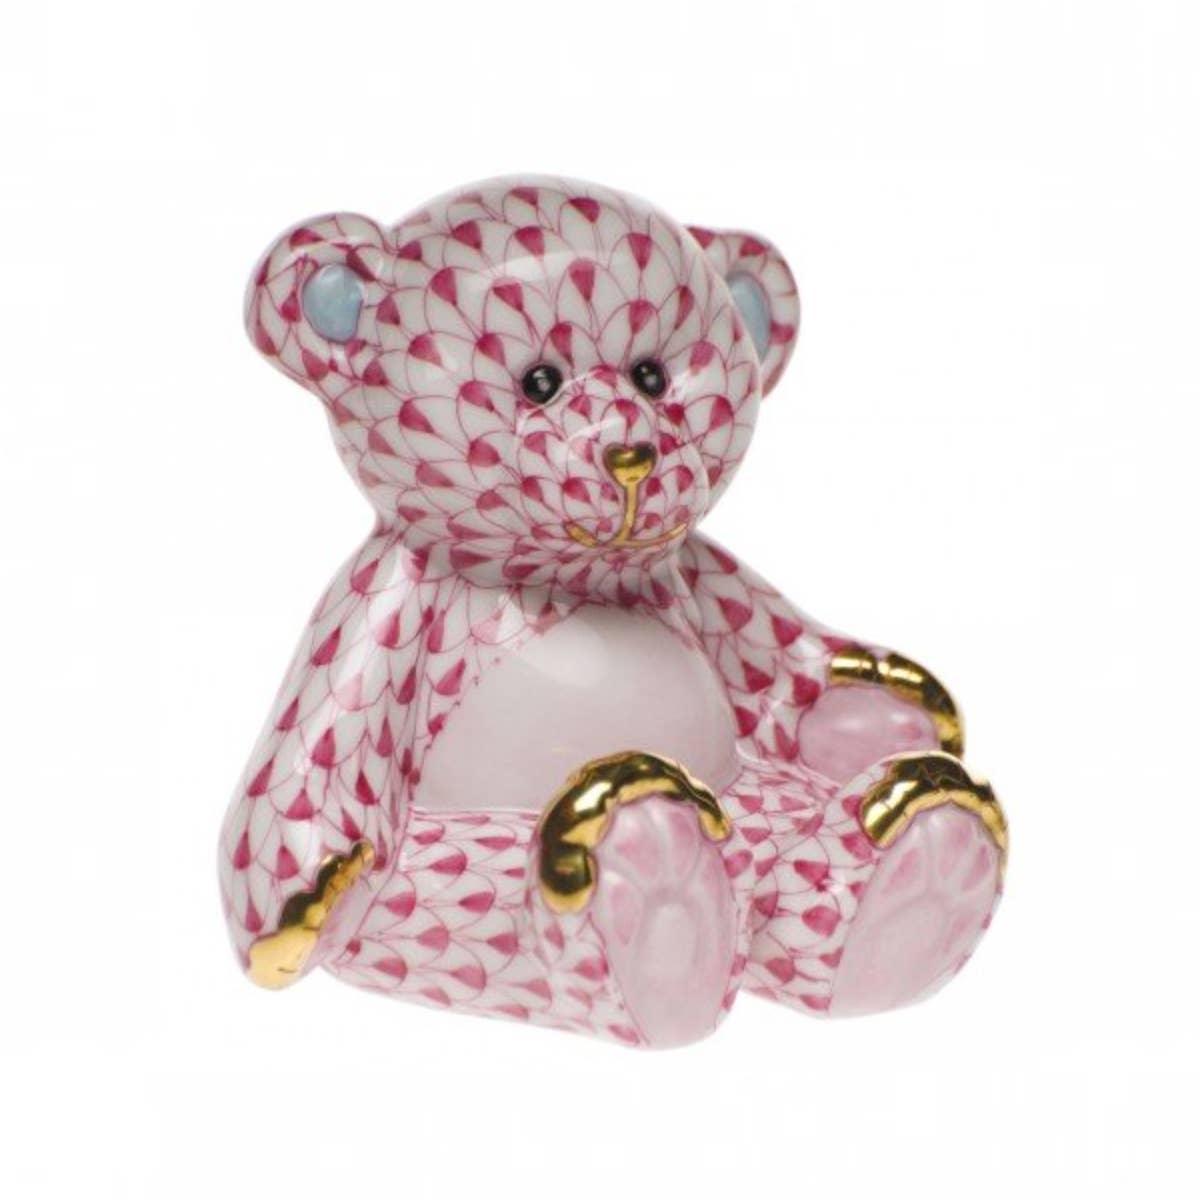 Fishnet Raspberry Small Teddy Bear